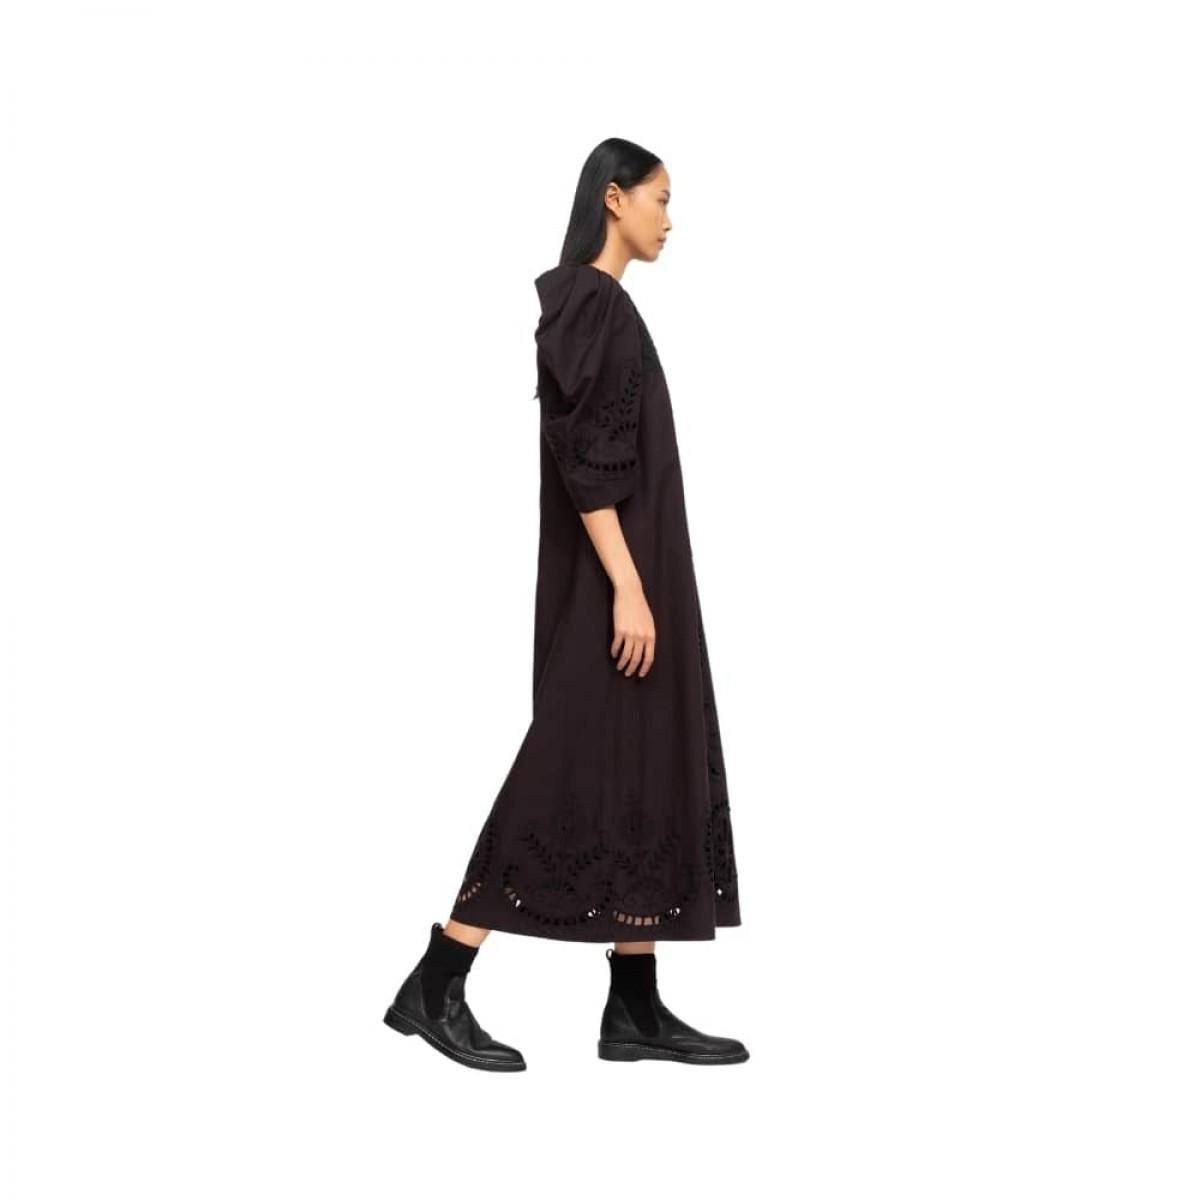 santos eyelet dress - black - model fra siden